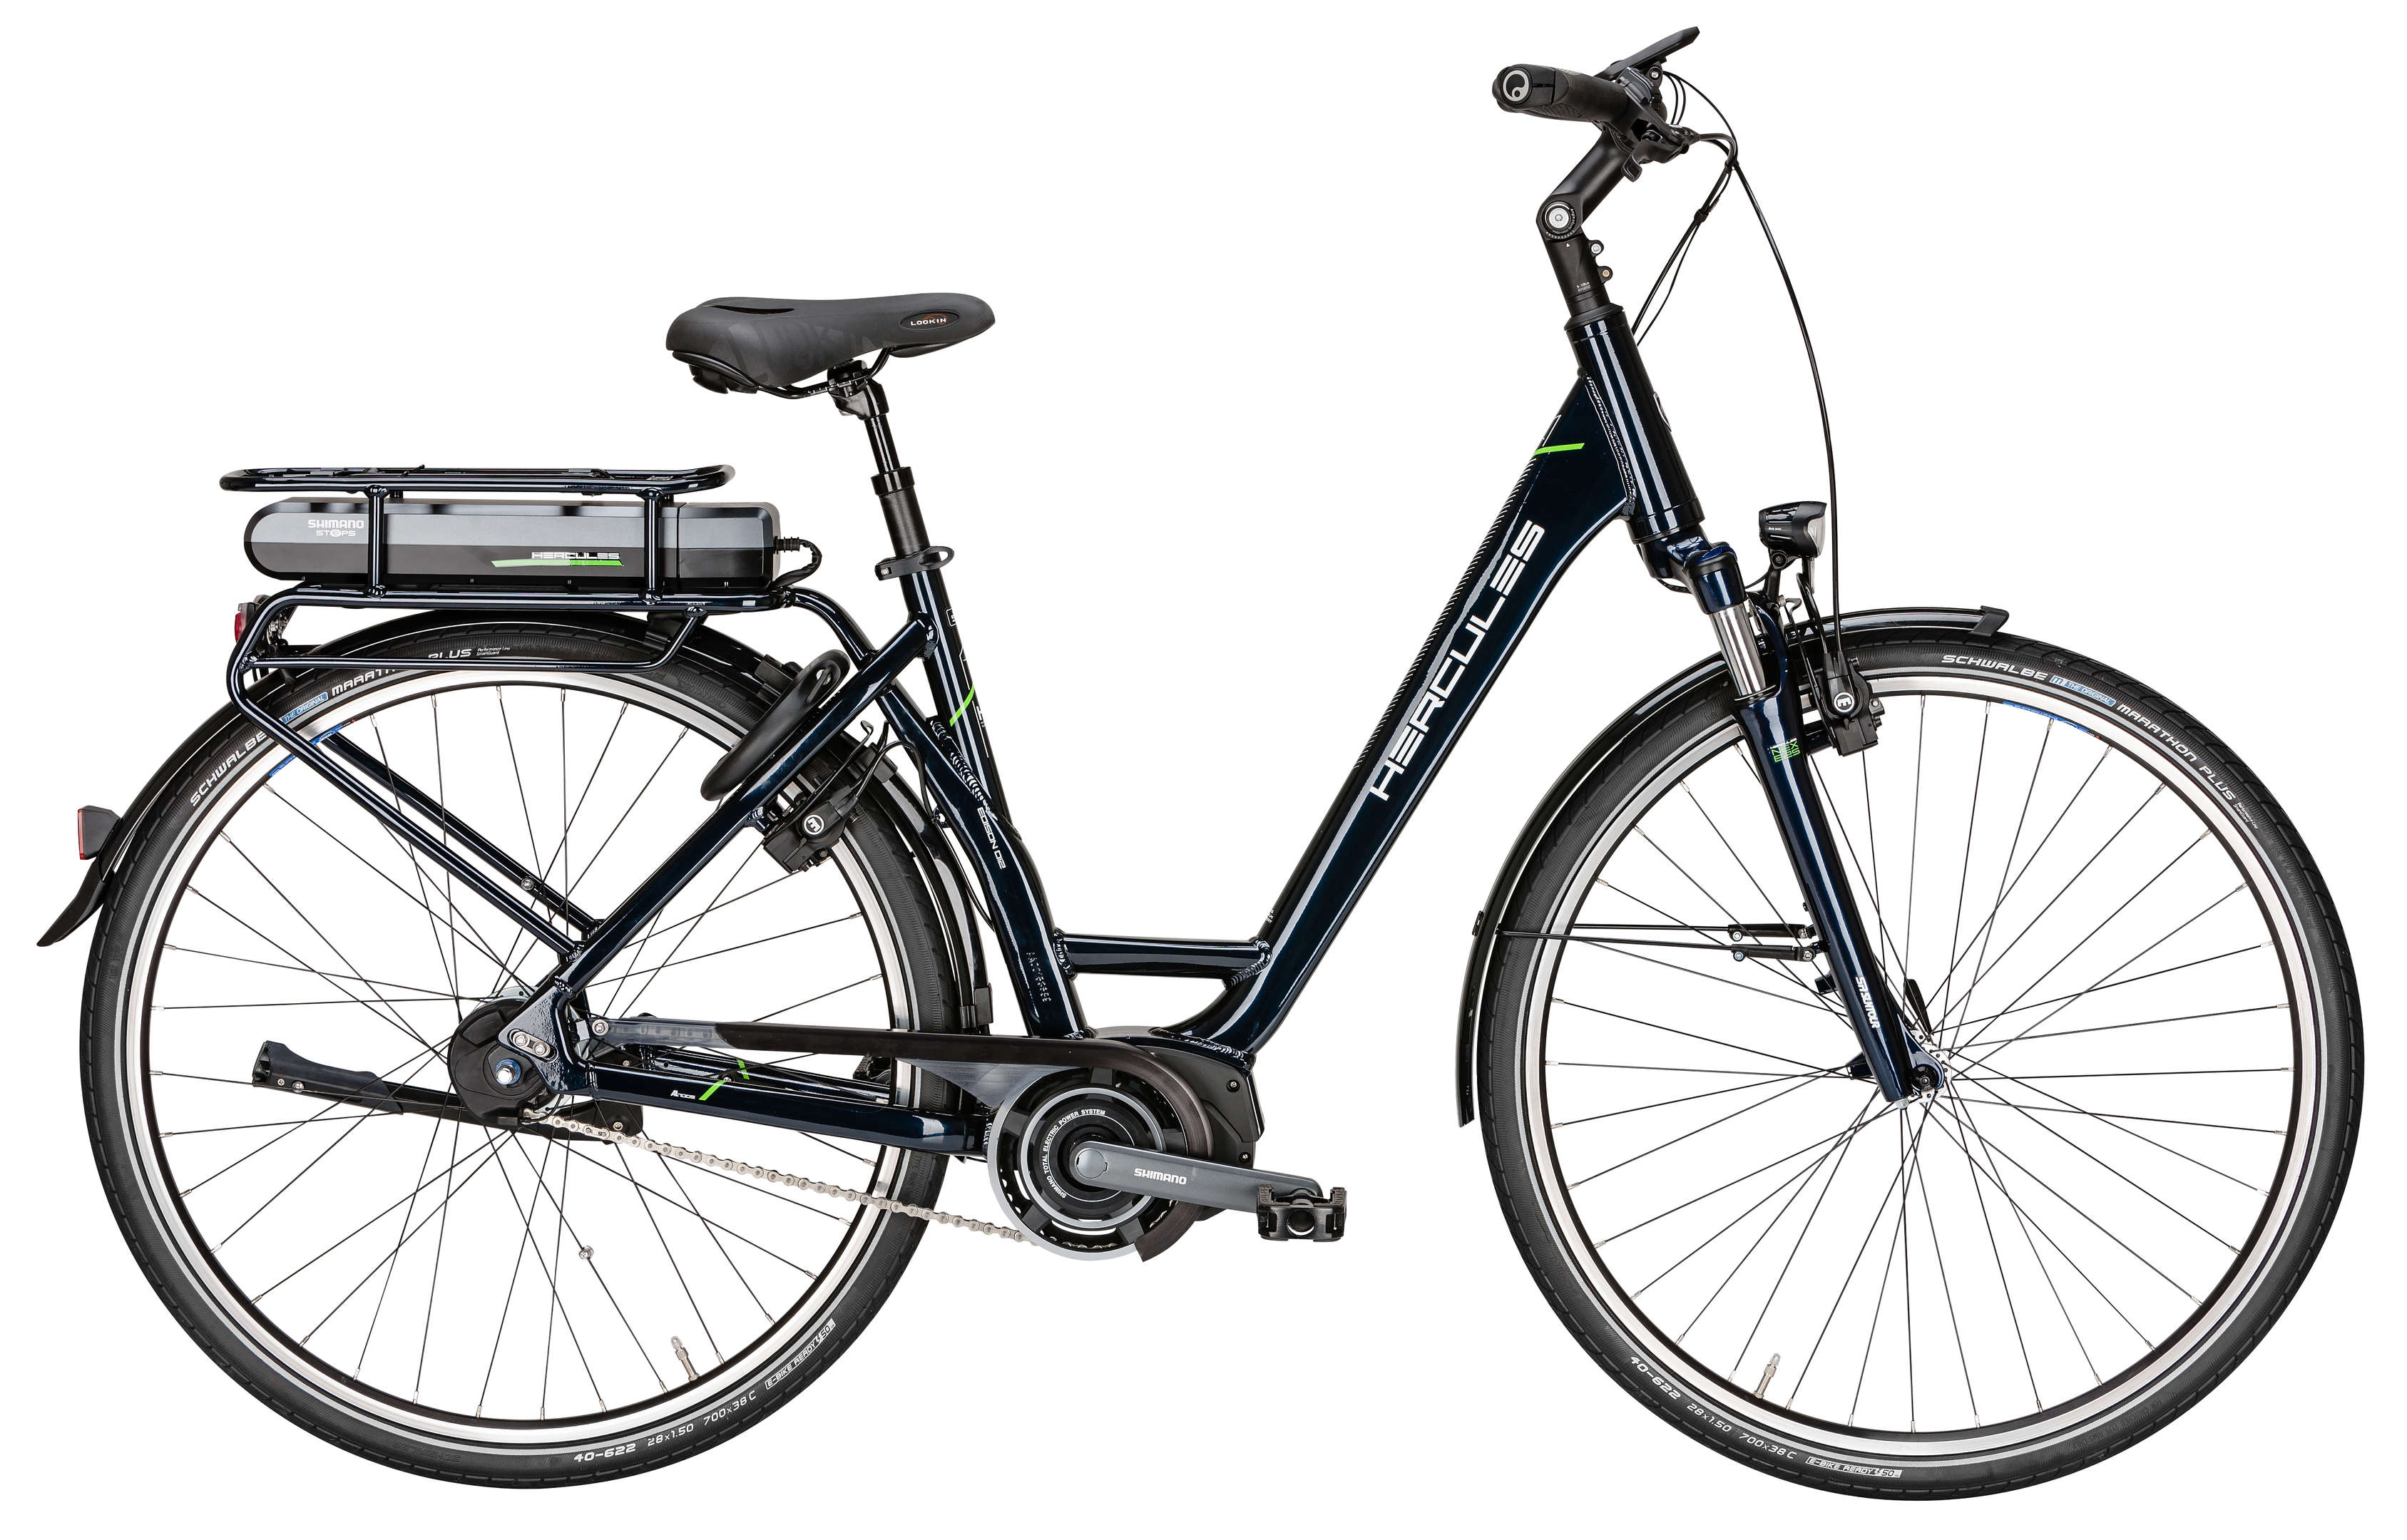 hercules e bike edison di2 r8 eurorad bikeleasingeurorad. Black Bedroom Furniture Sets. Home Design Ideas